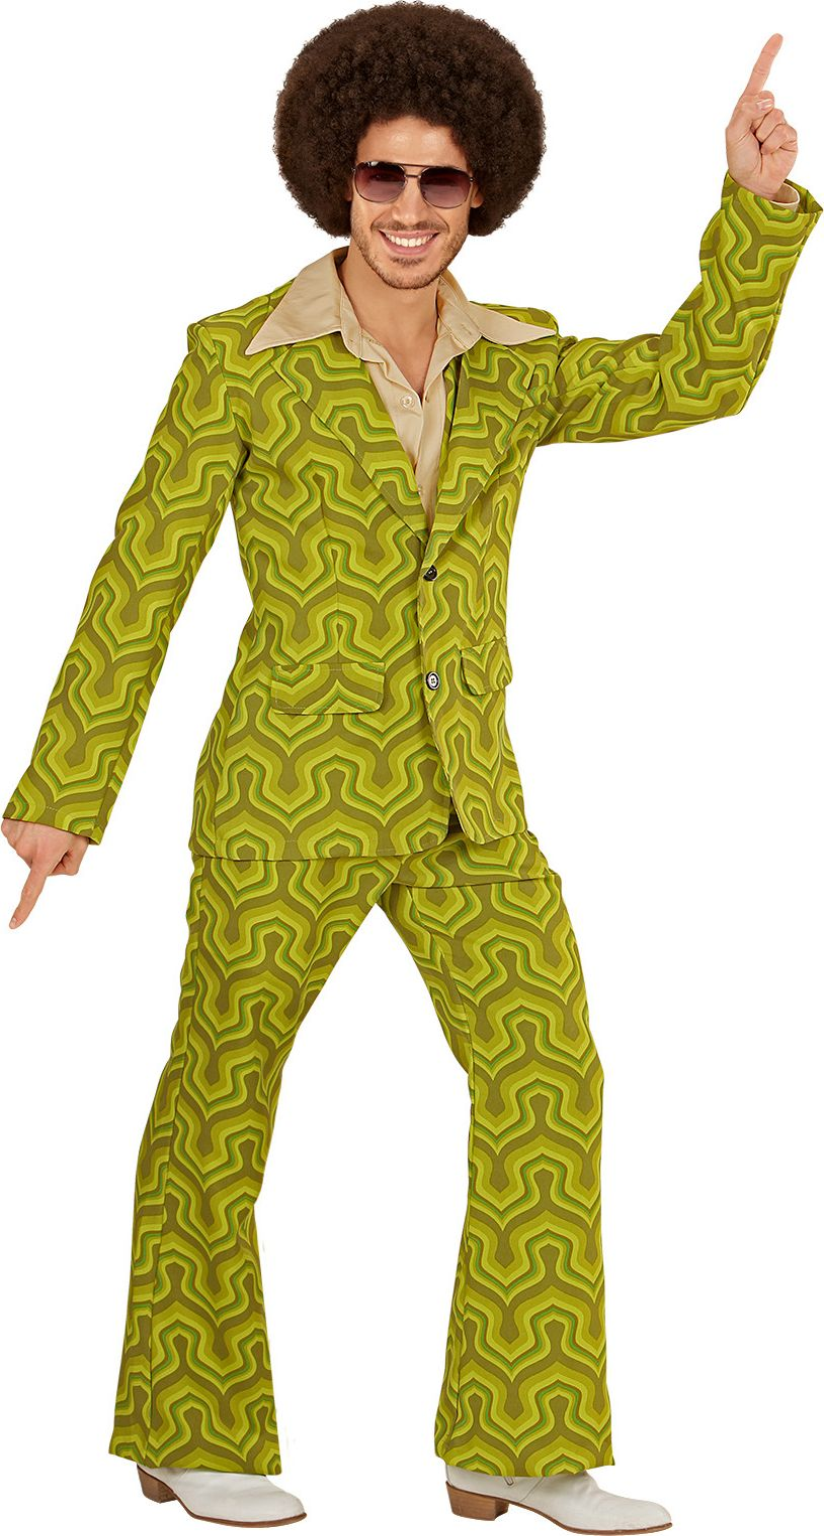 Groene jaren 70 outfit